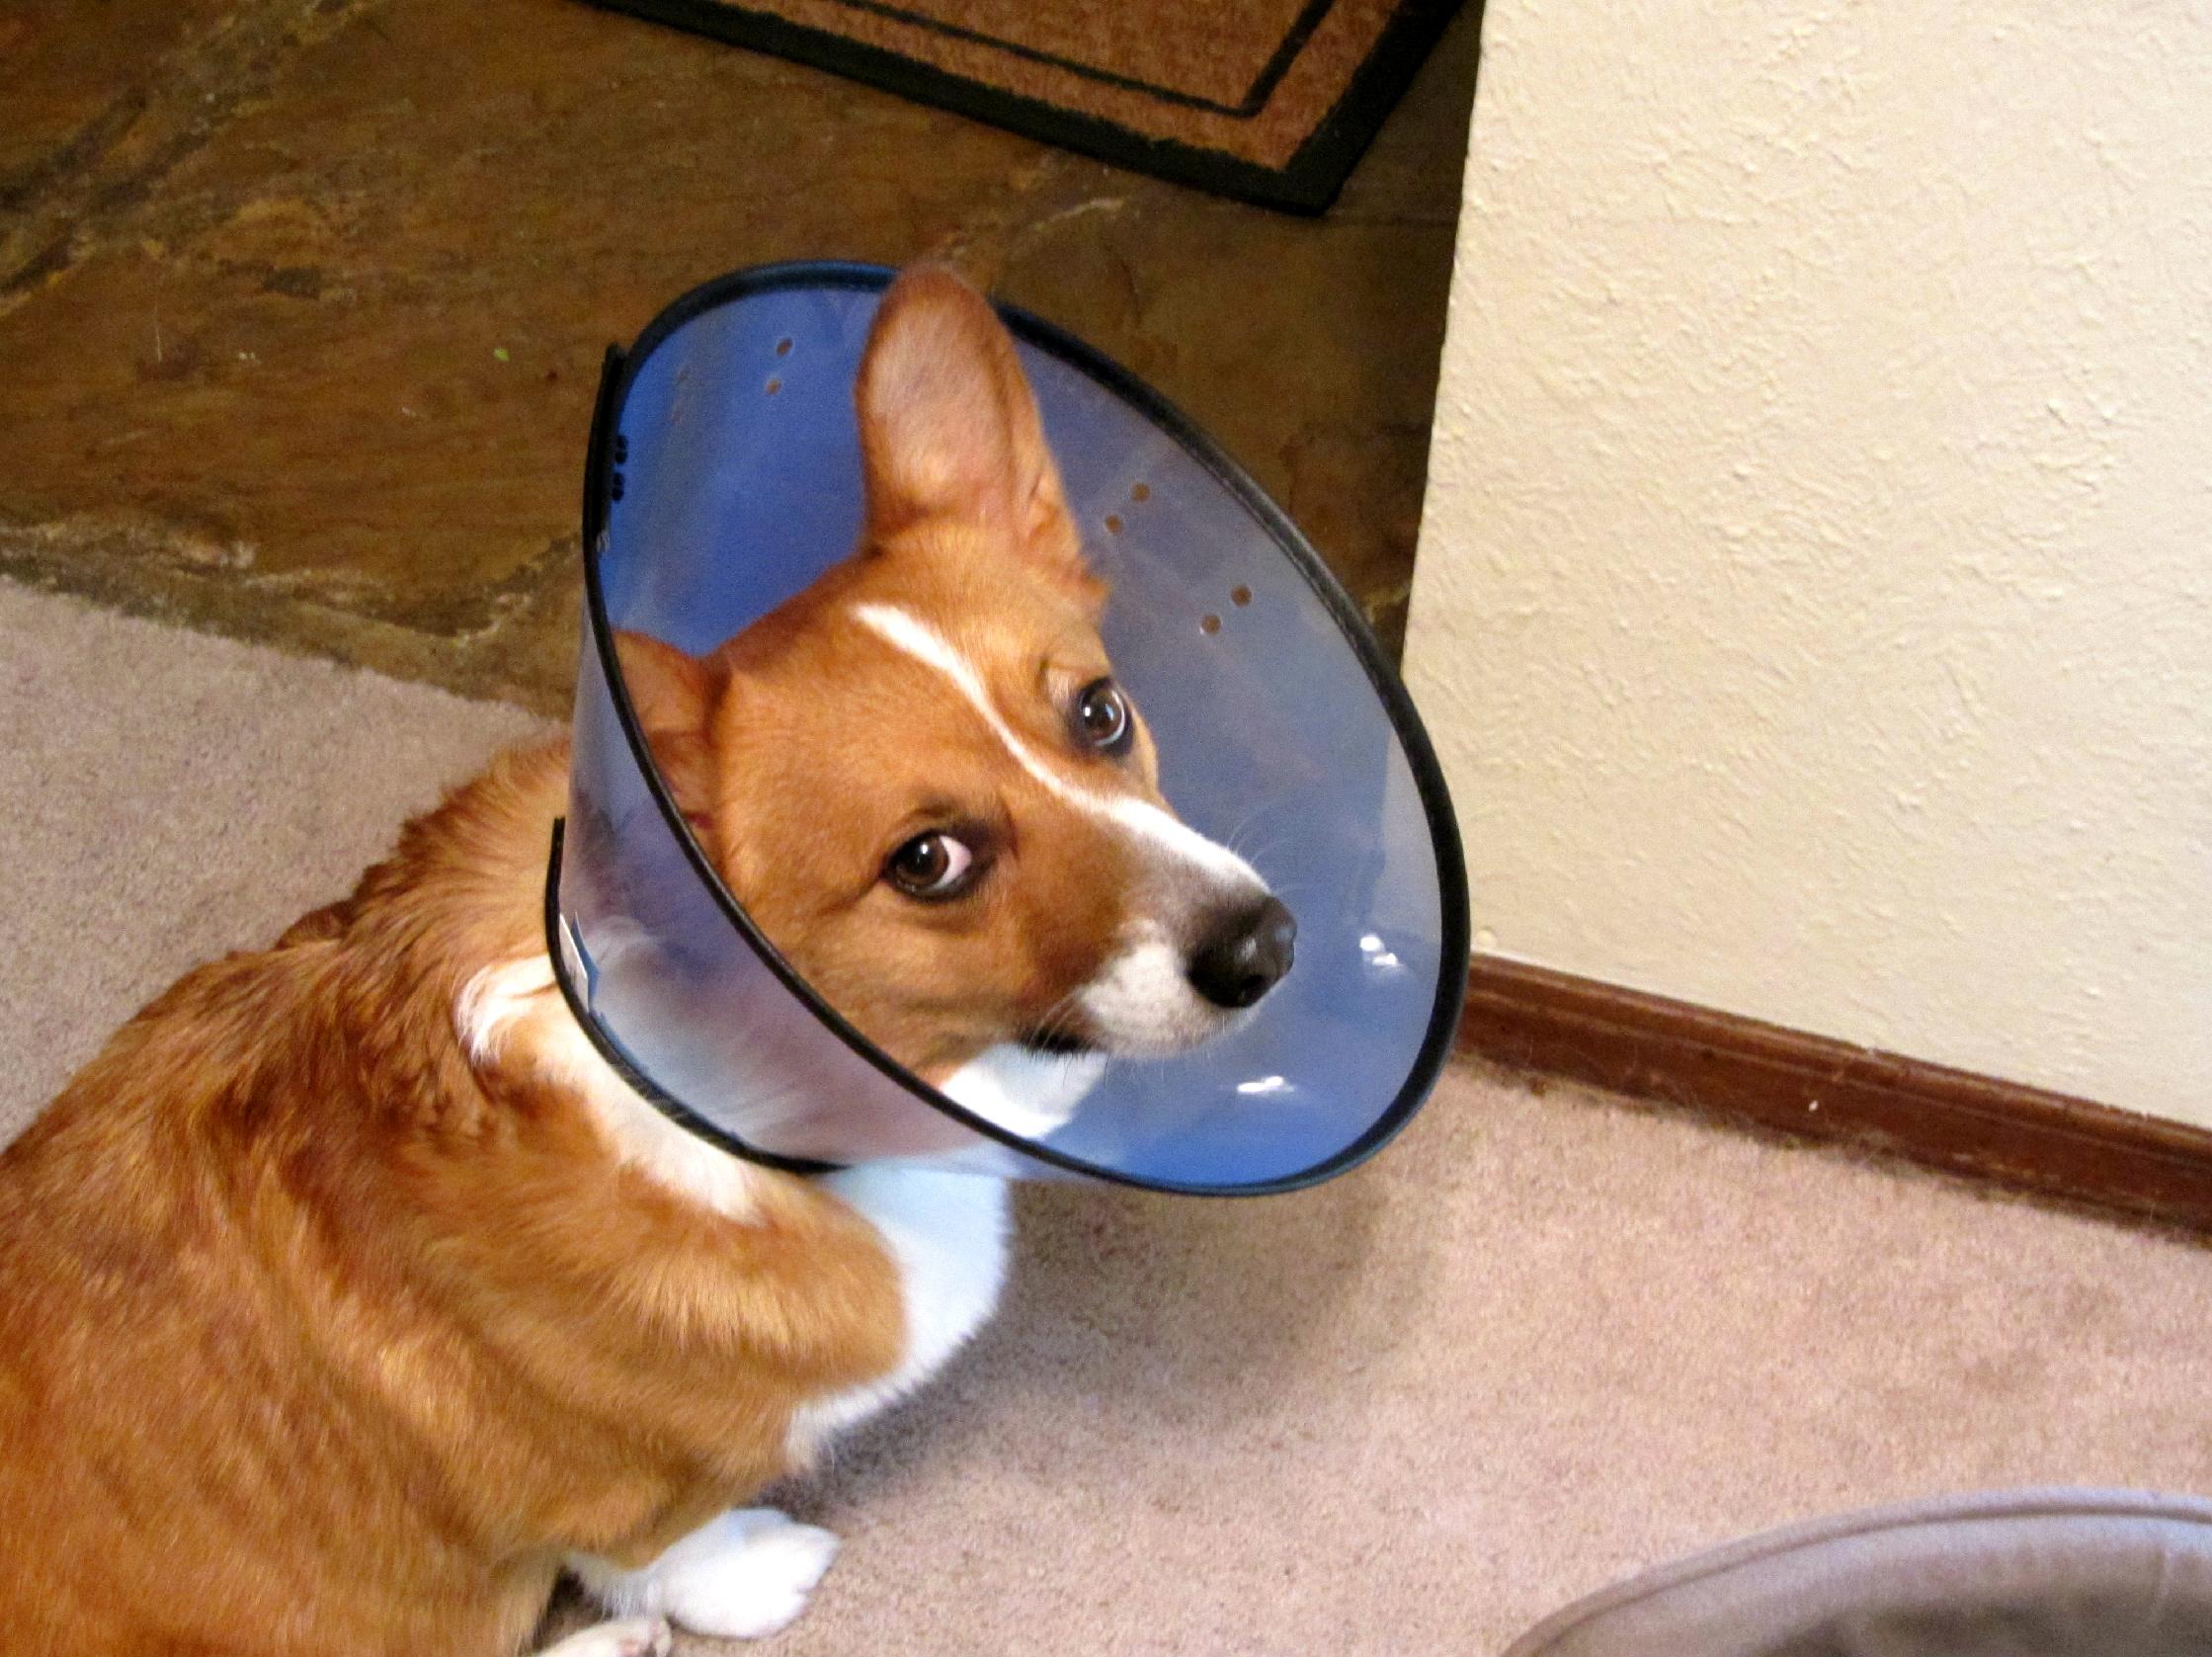 Amusing Shame Pet Shame Ny Cone For Hot Spot Conviction Cone bark post Cone Of Shame